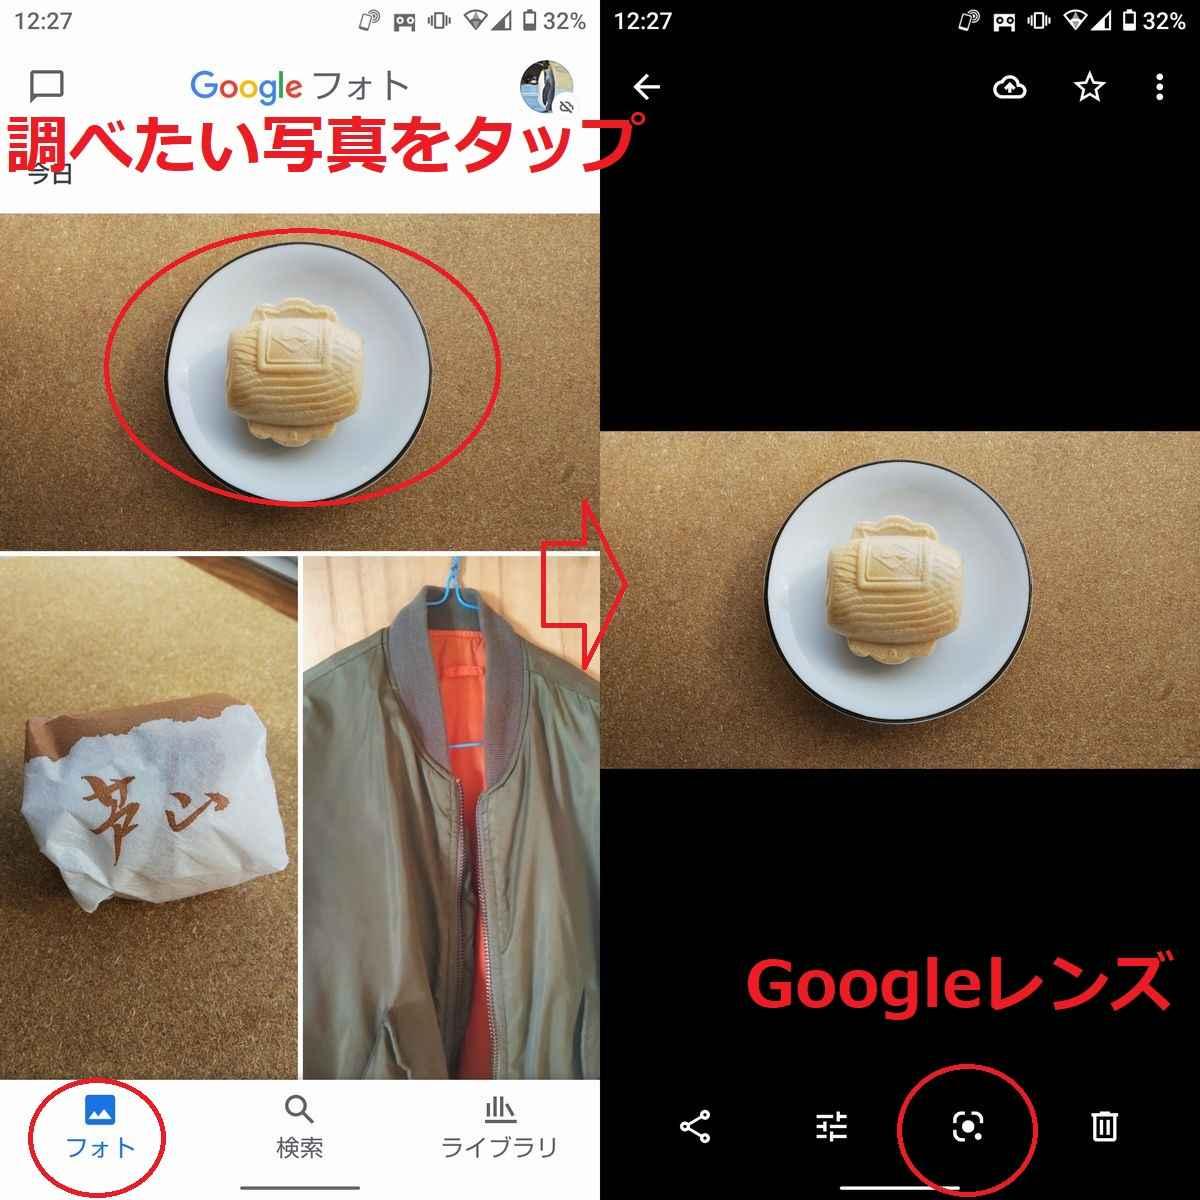 Googleレンズの操作手順